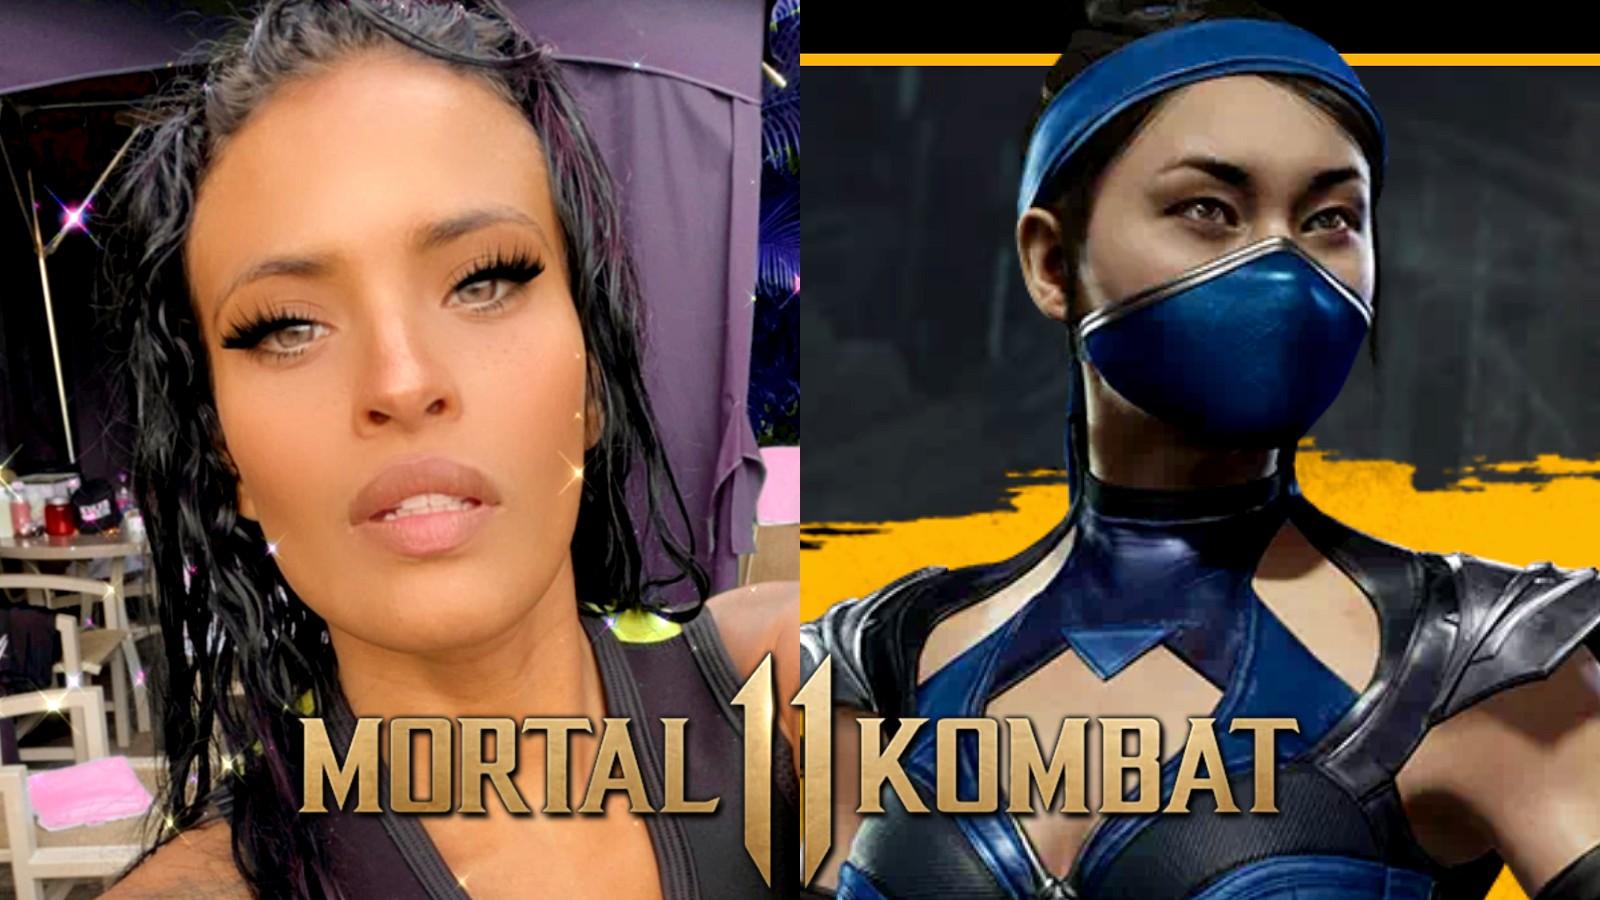 Zelina Vega next to Kitana from Mortal Kombat